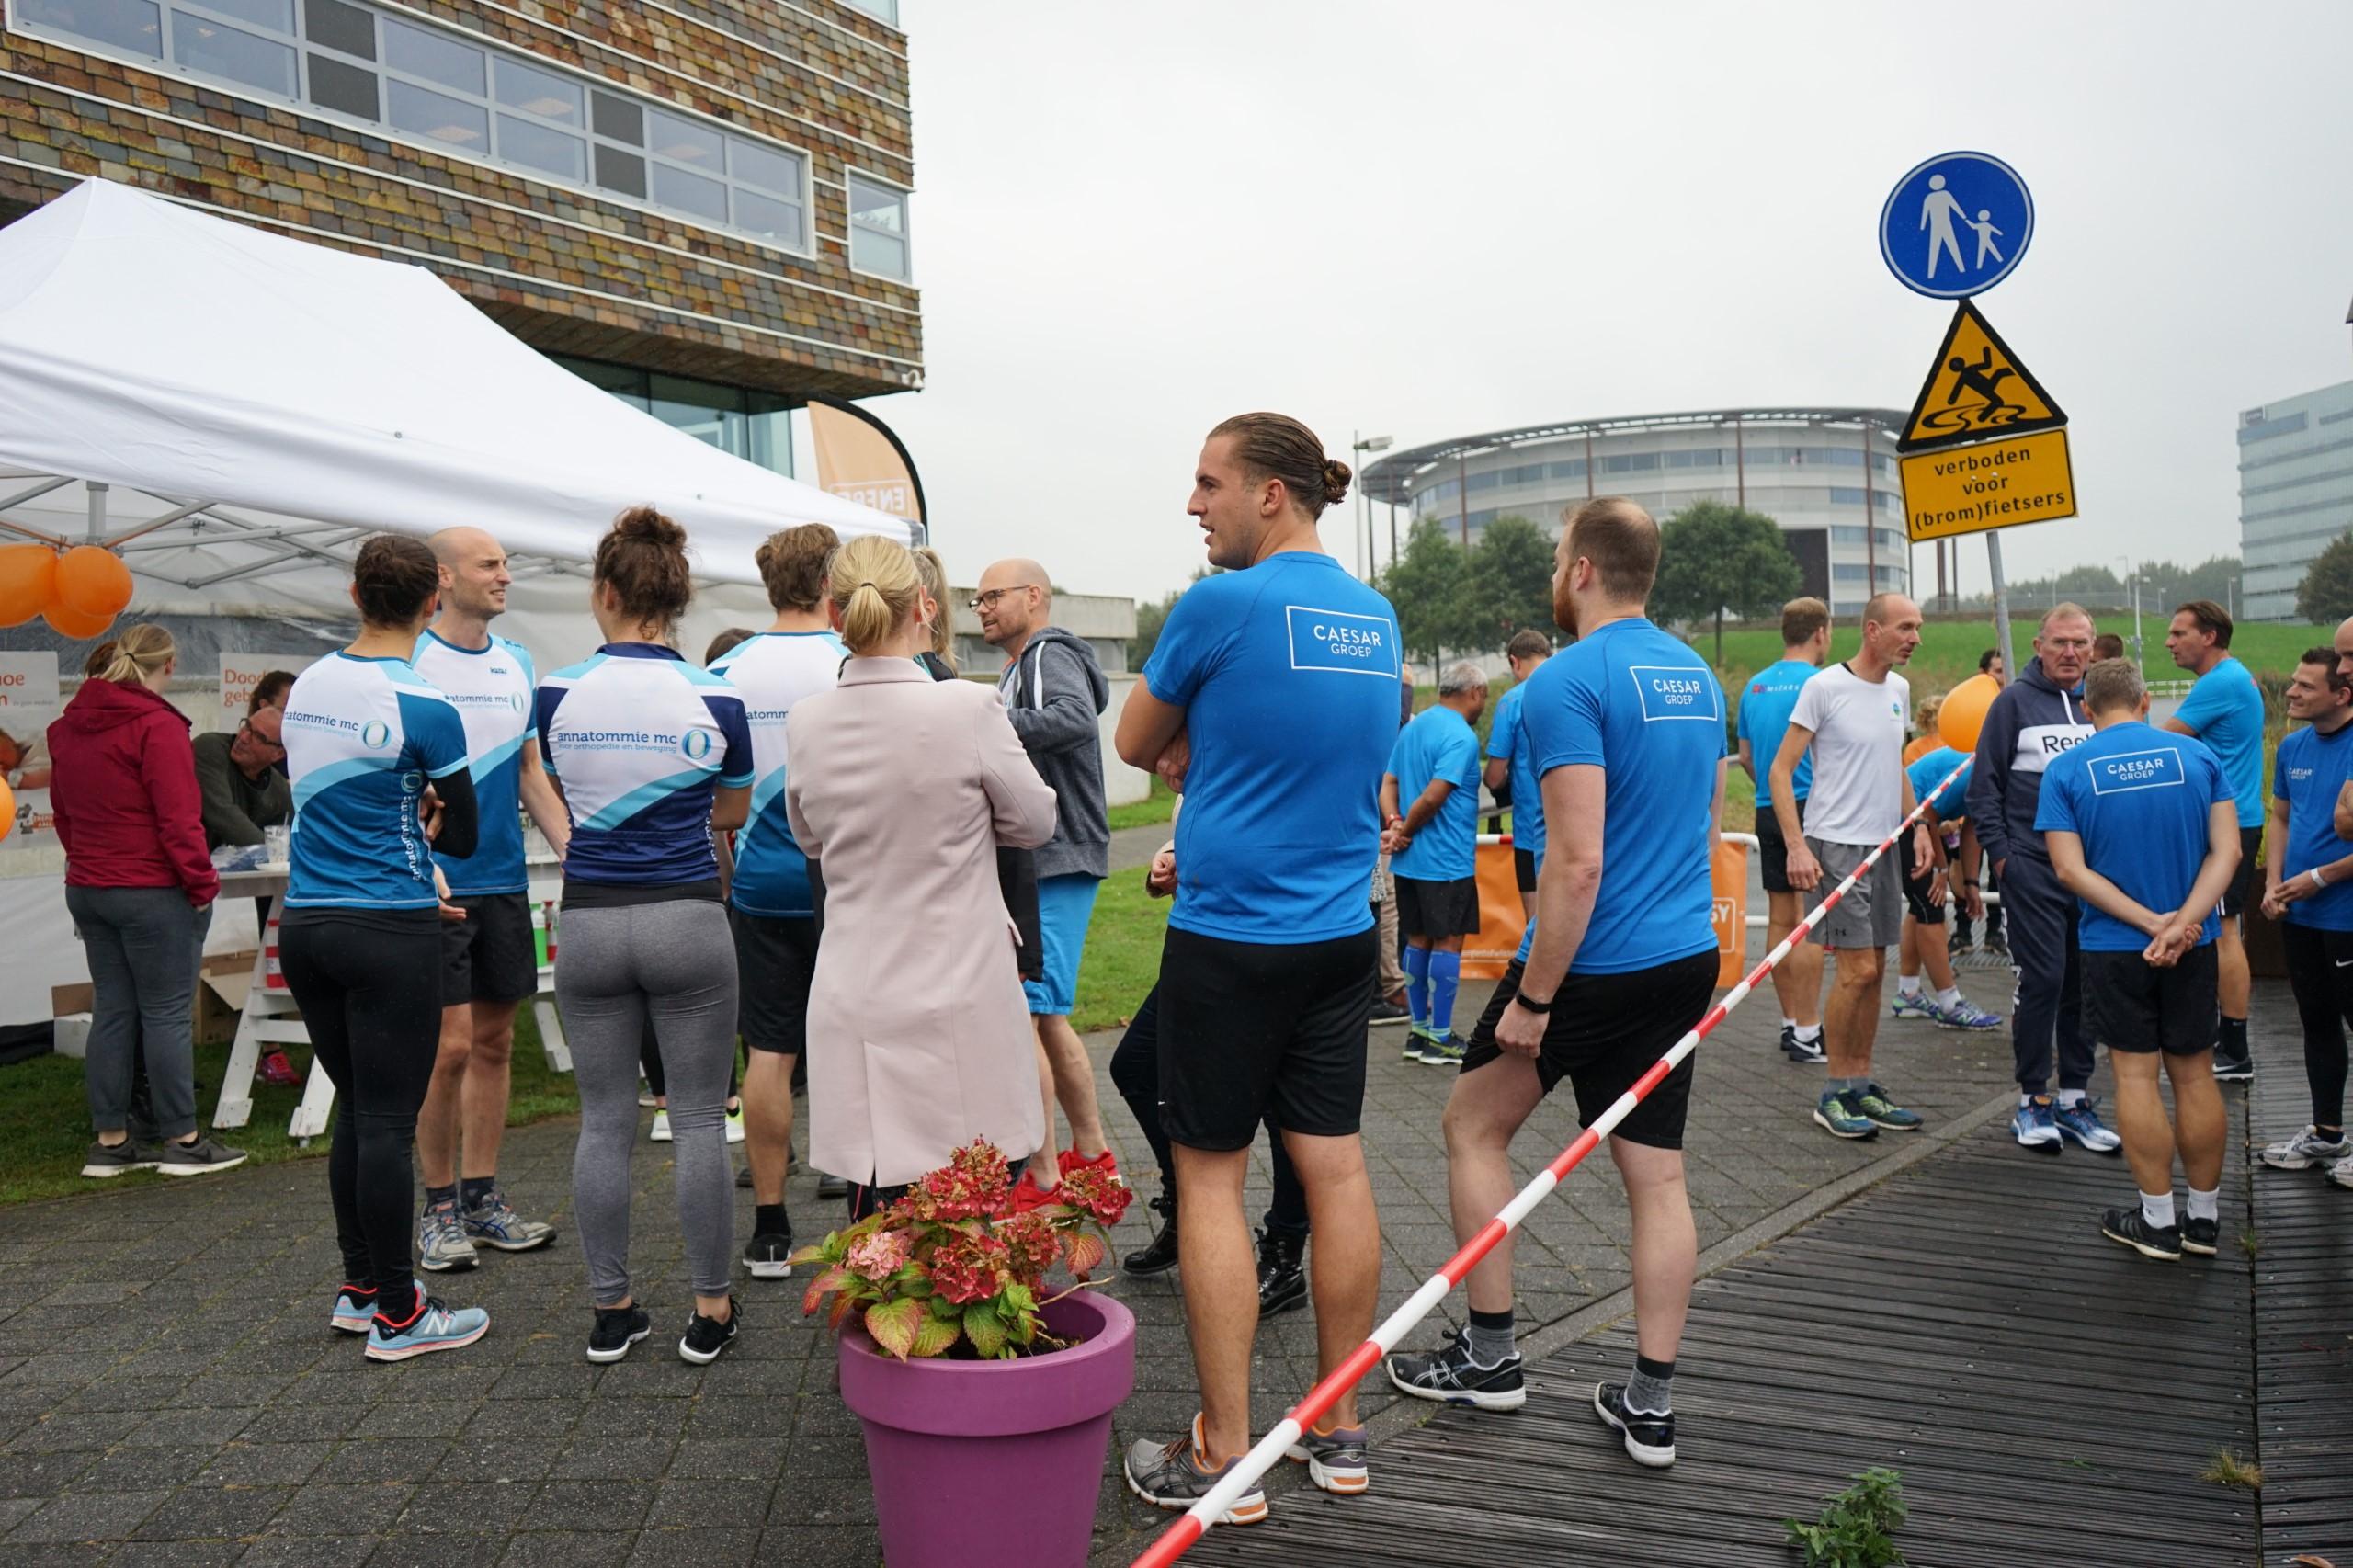 Papendorpse Run 2019 - Groep